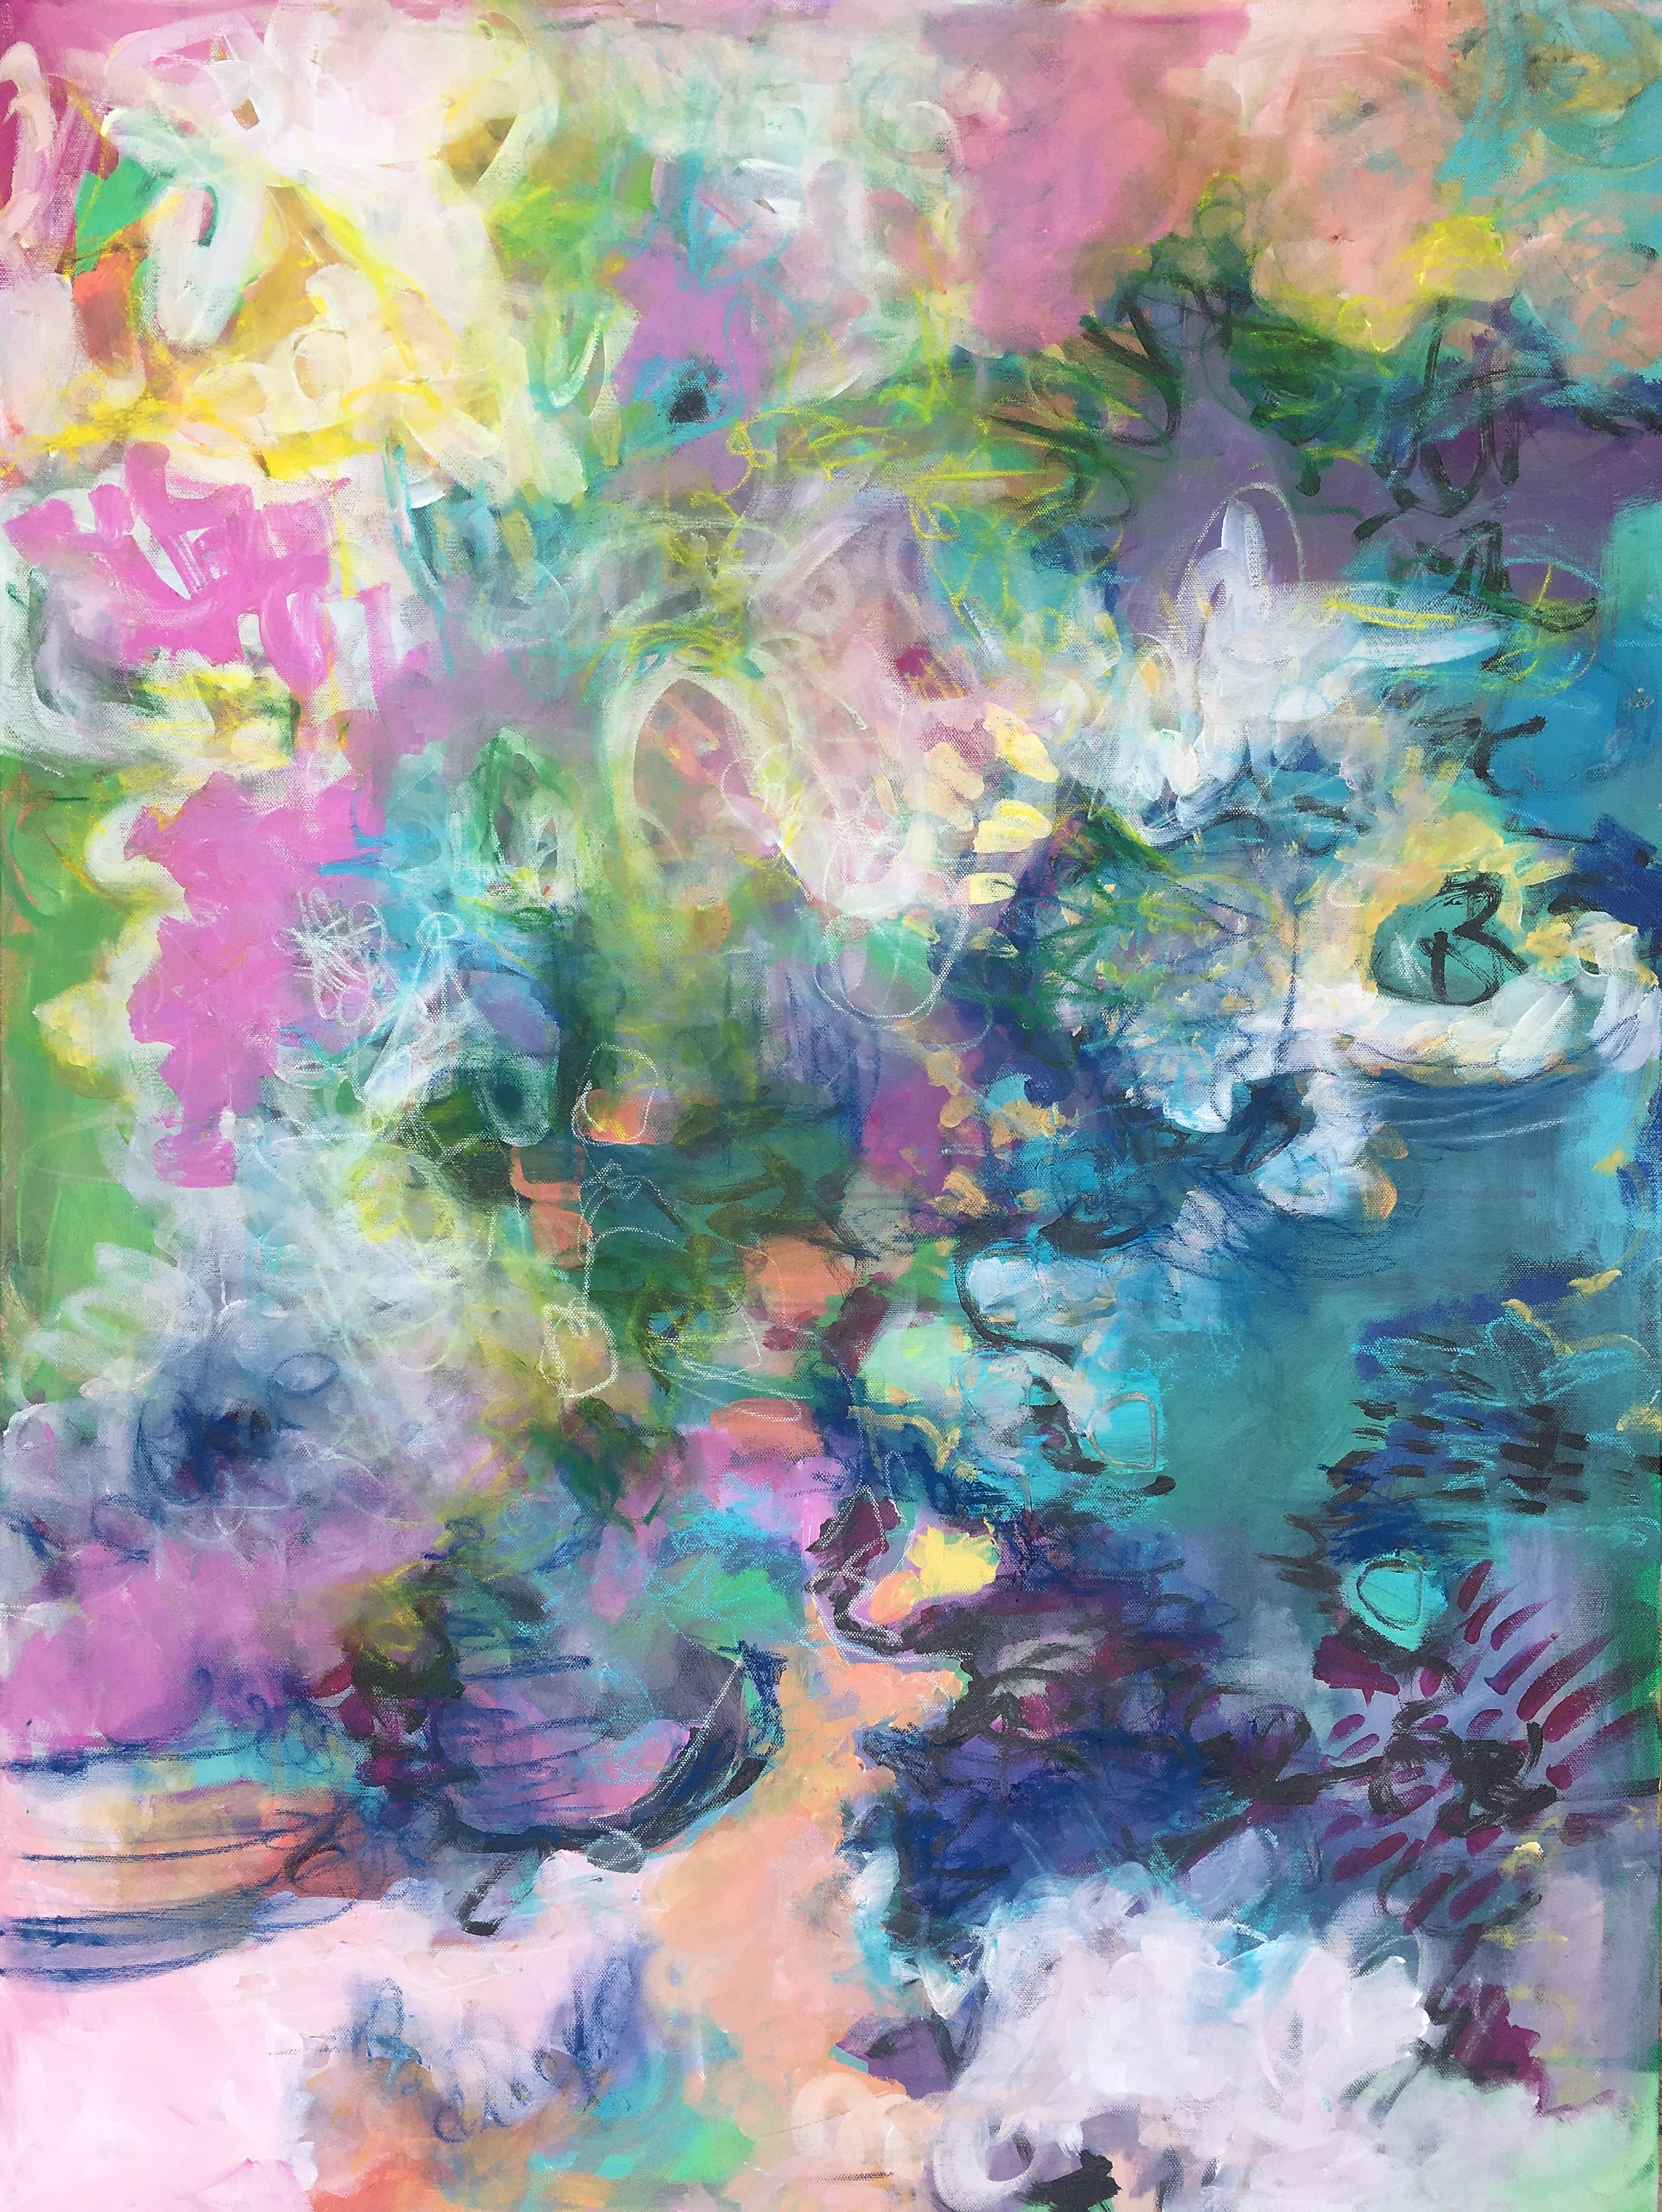 Erol's Joy by Laurie Maves | ArtworkNetwork.com